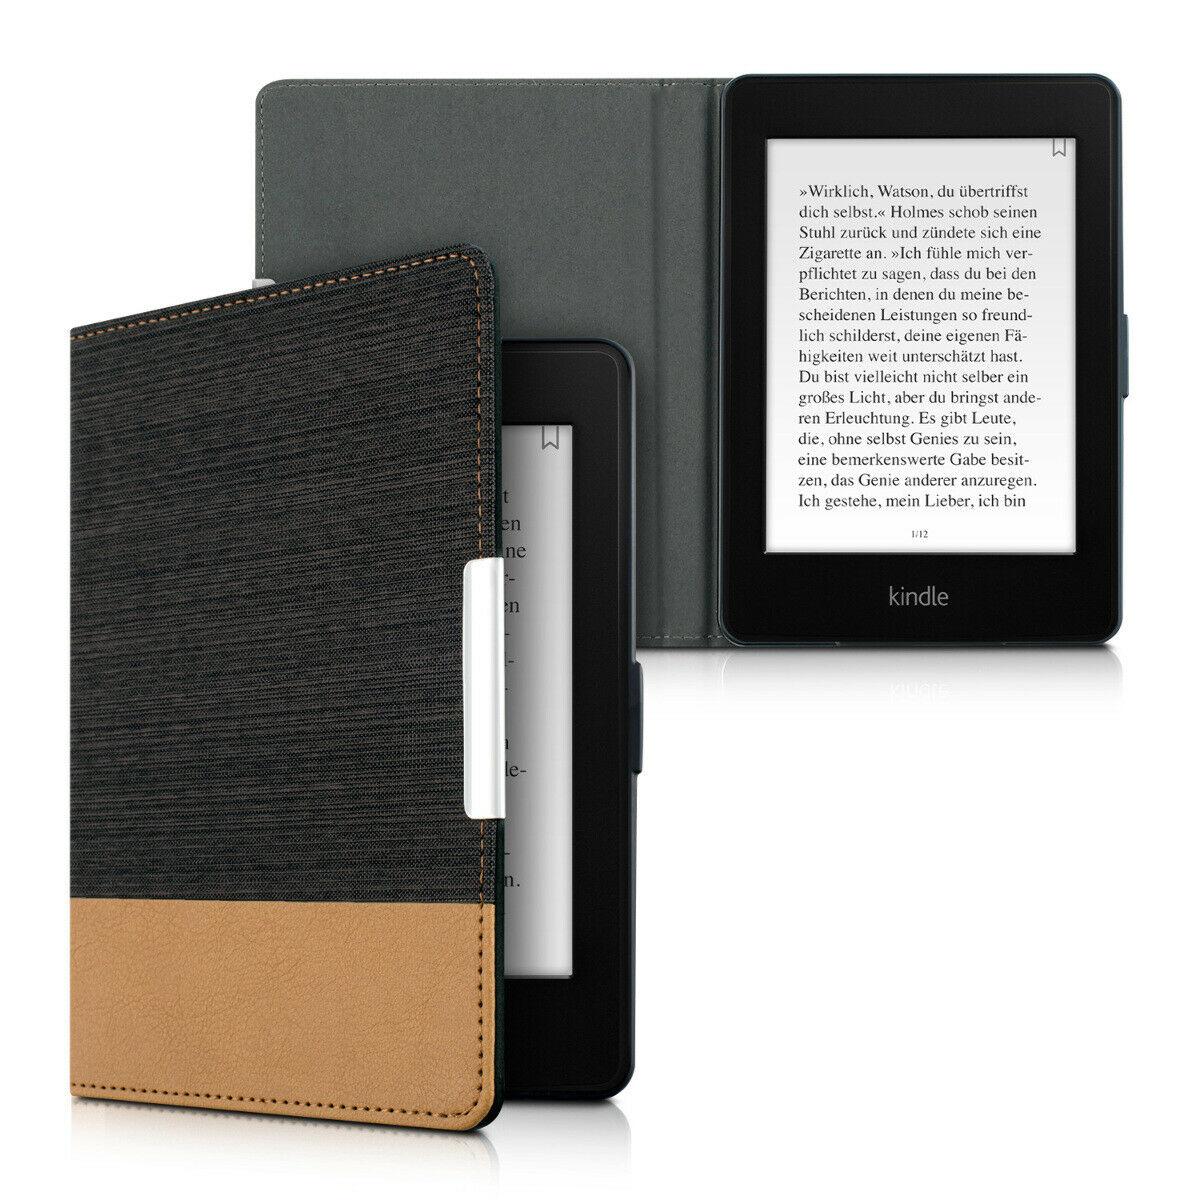 Pouzdro pro Amazon Kindle Paperwhite hnědé